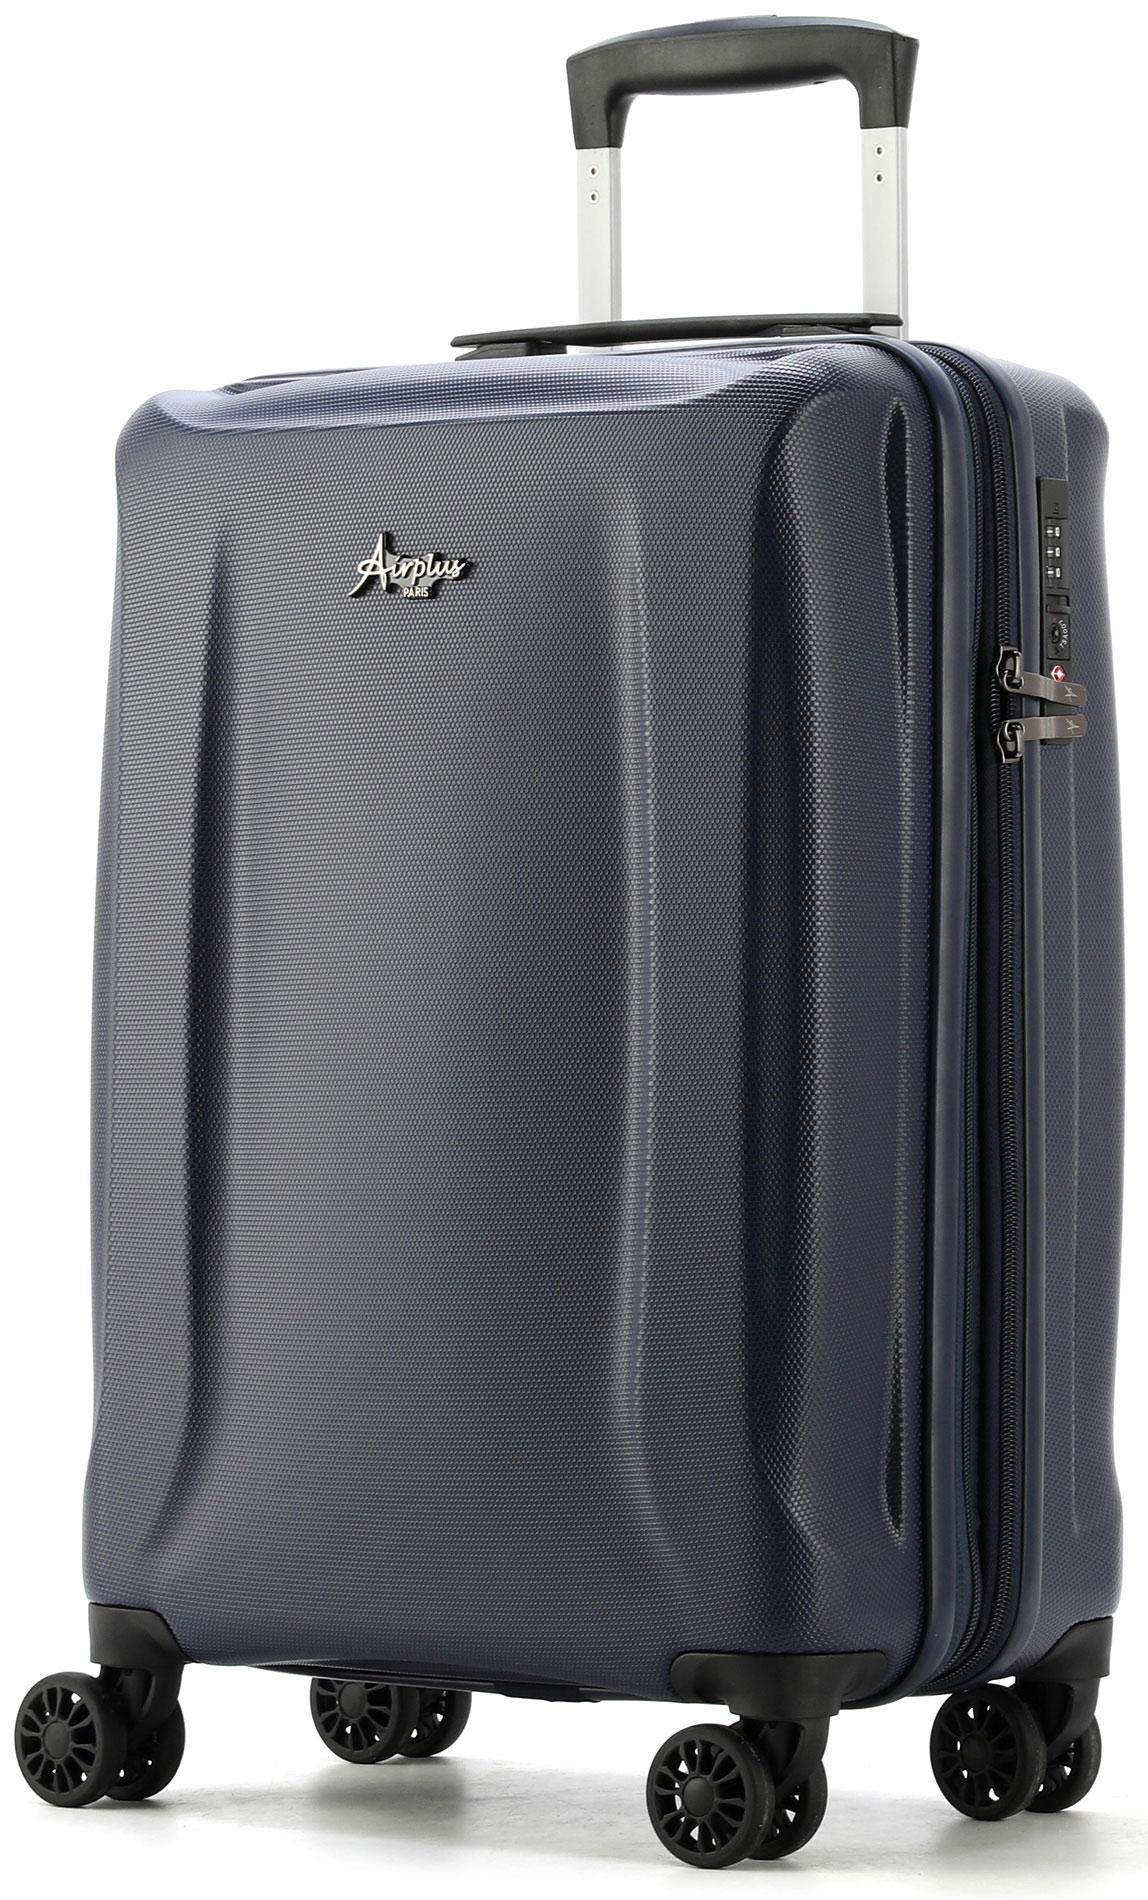 AIRPLUS PHOENIX Bagage cabine